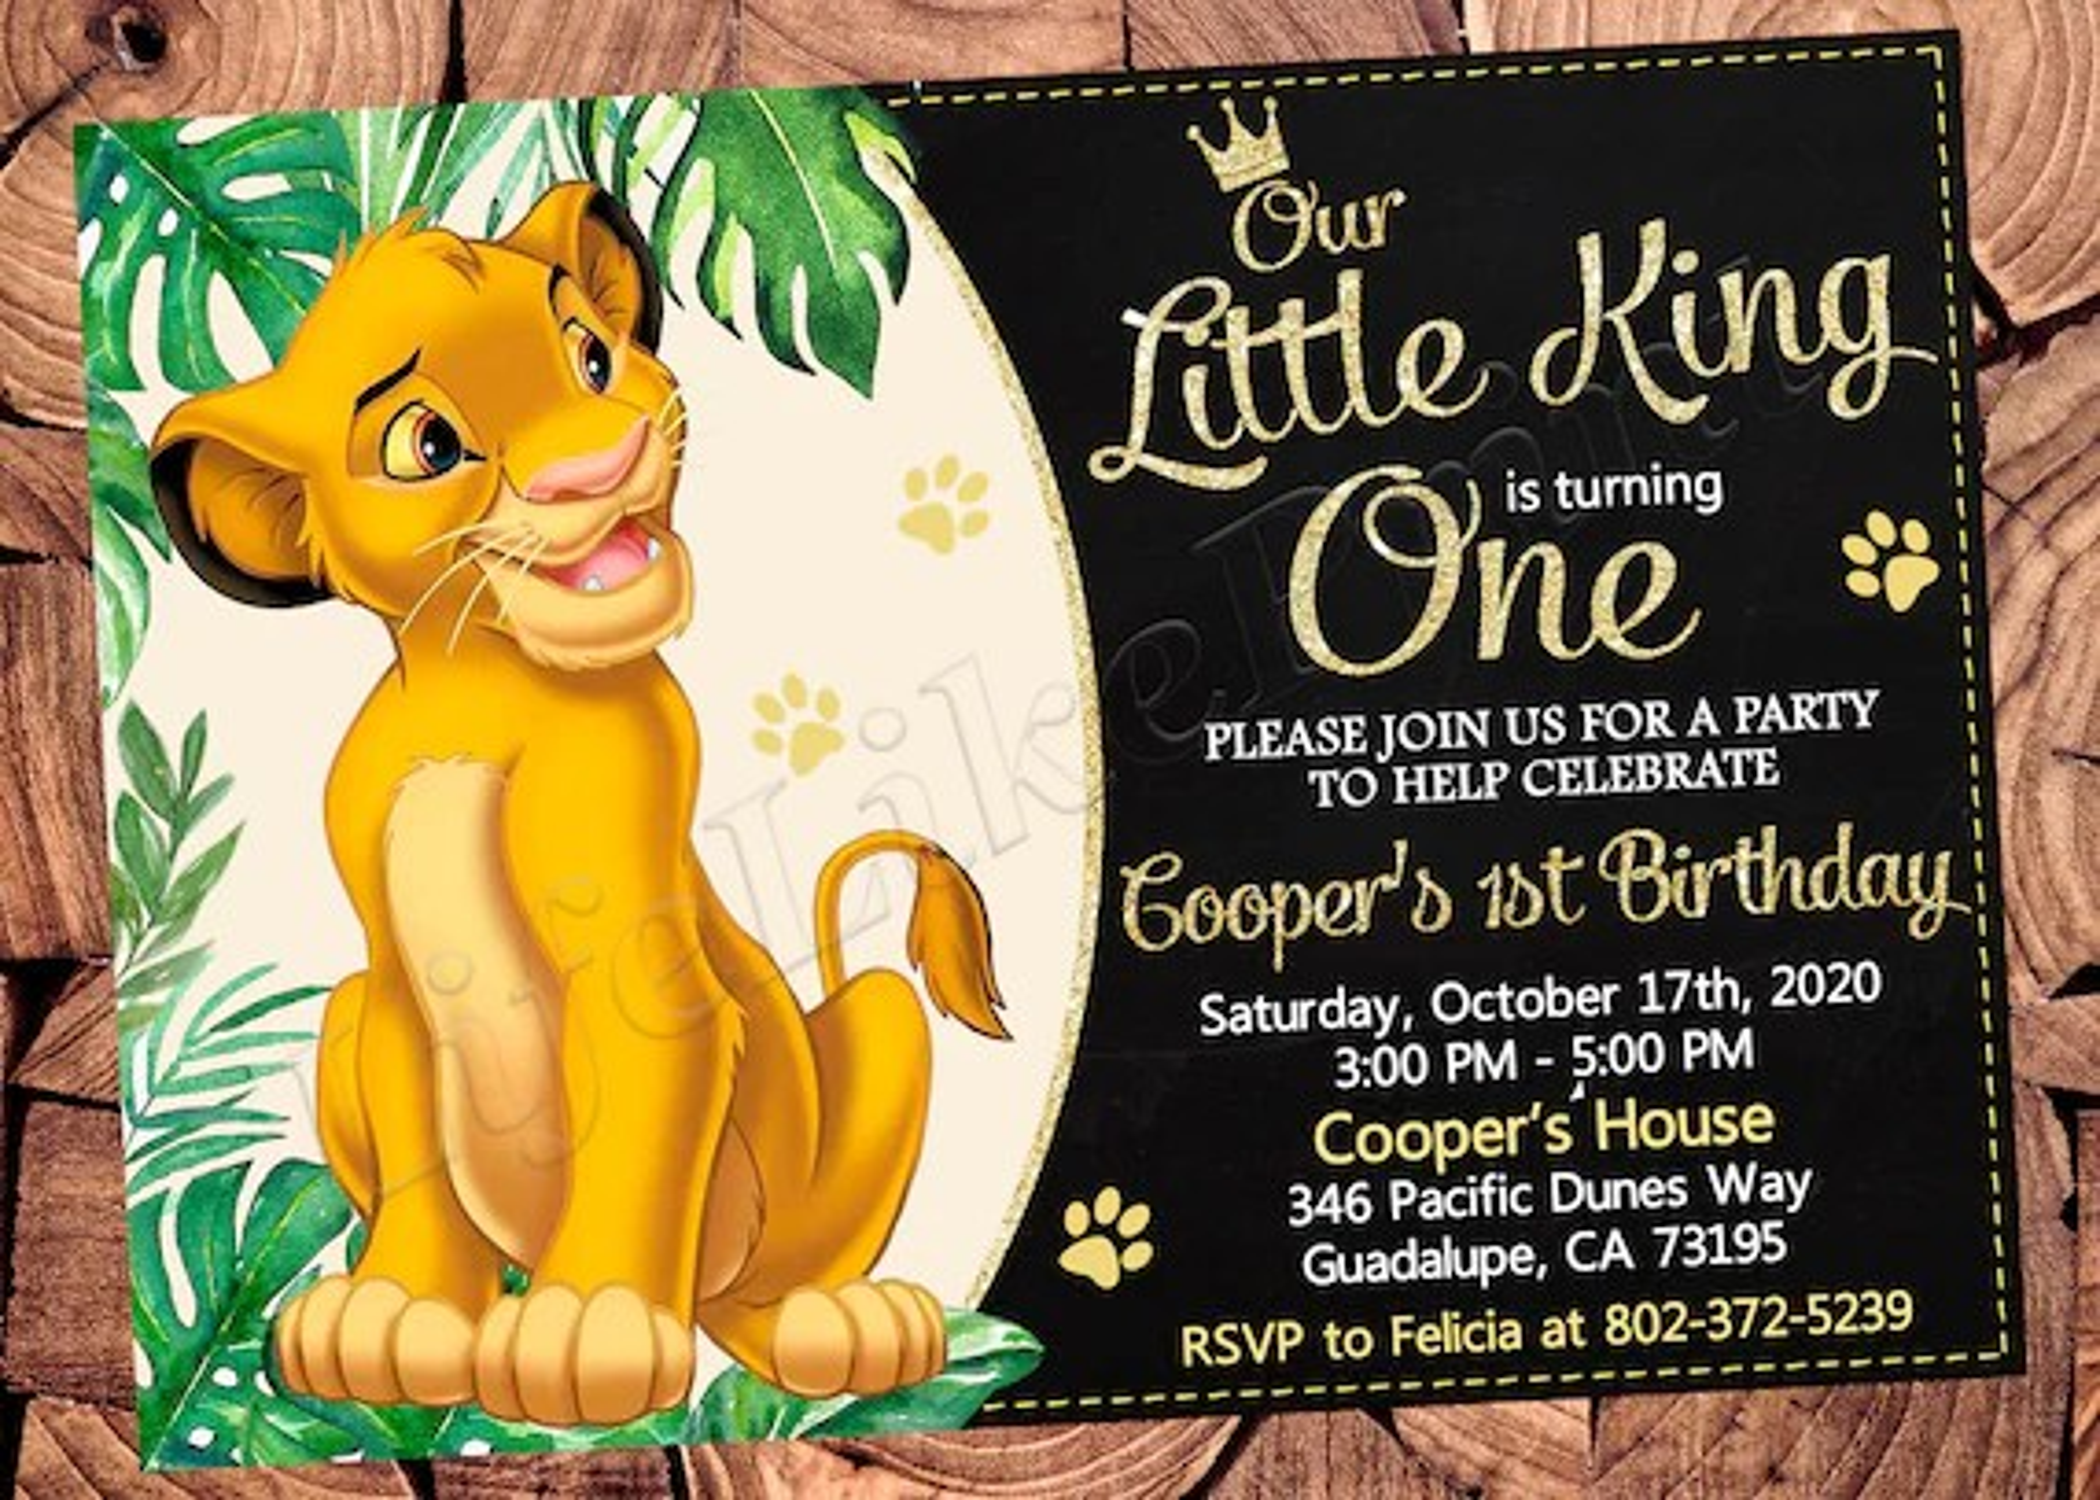 lion king invitation lion king birthday invitation lion king party lion king invite lion king digital file lion king printable file